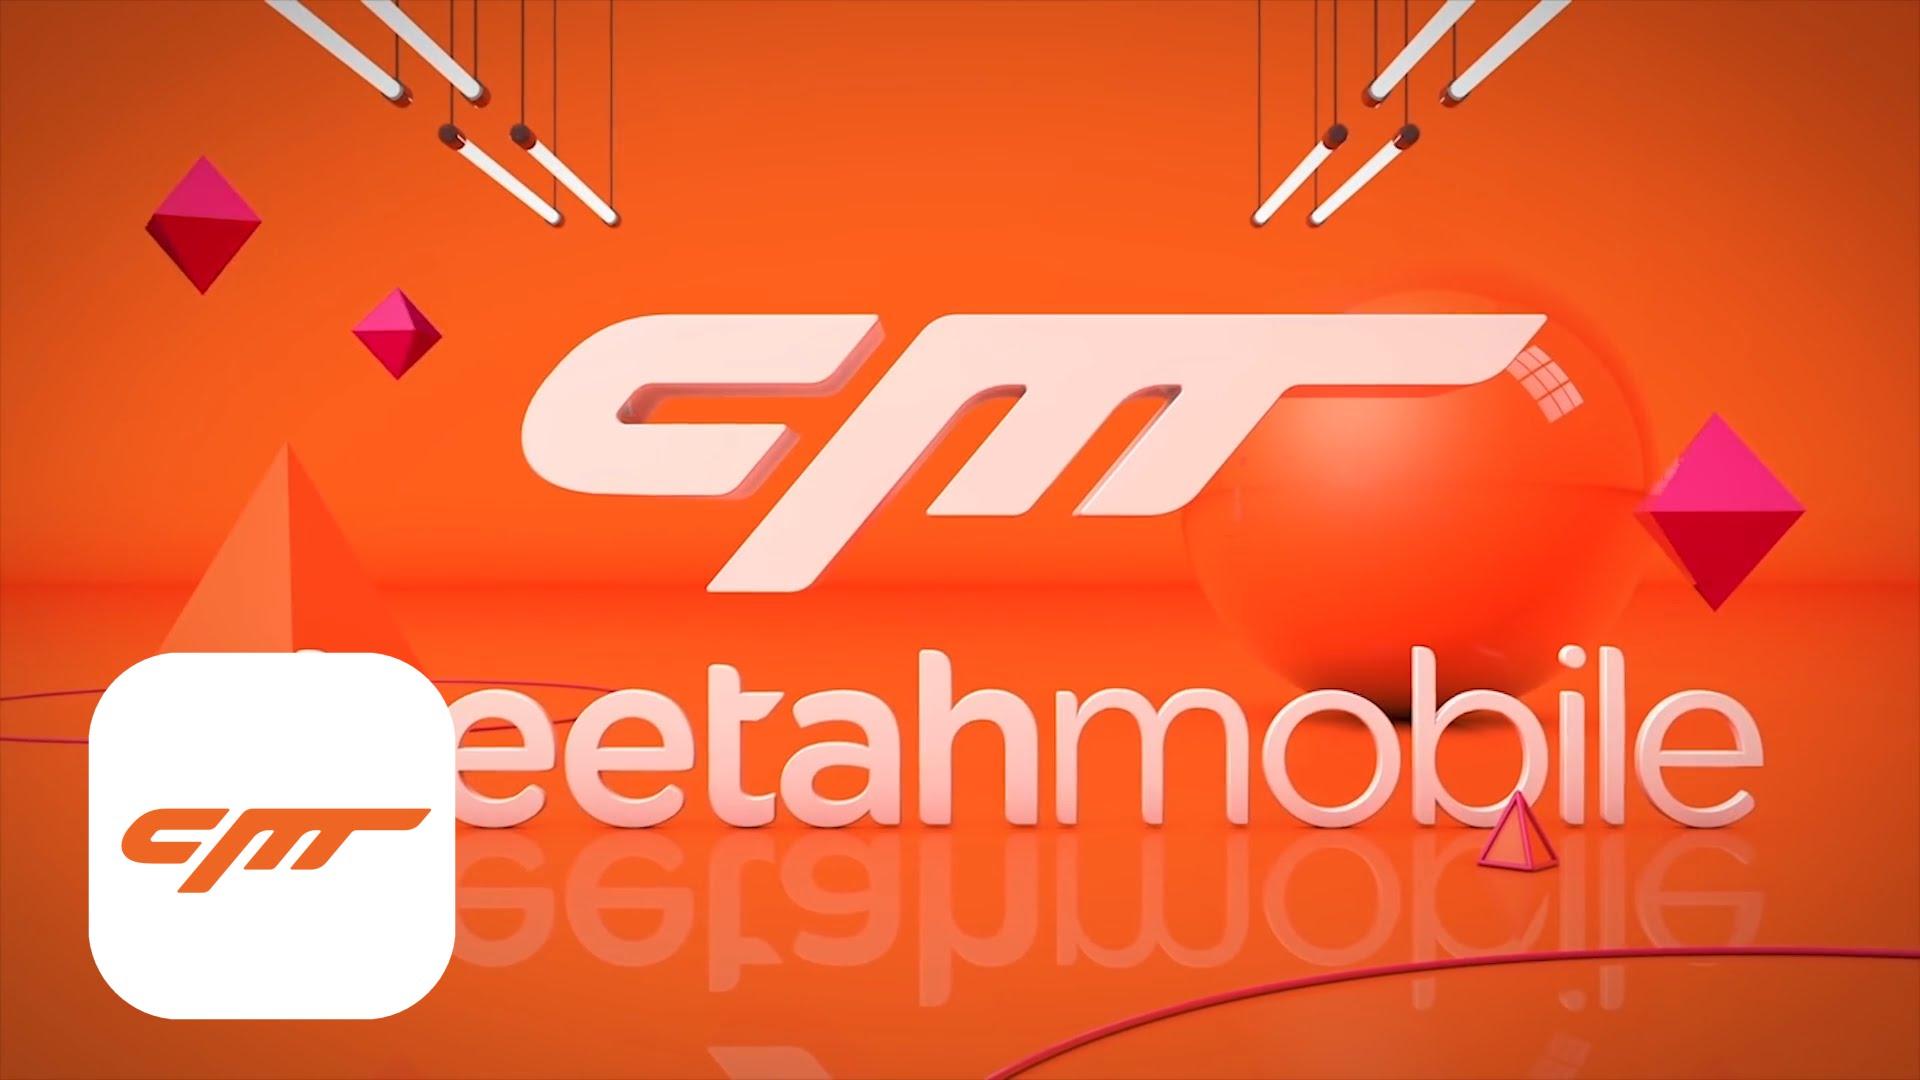 Cheetah Mobile Announces $100 Million Stock Buyback; Shares Rise 6%